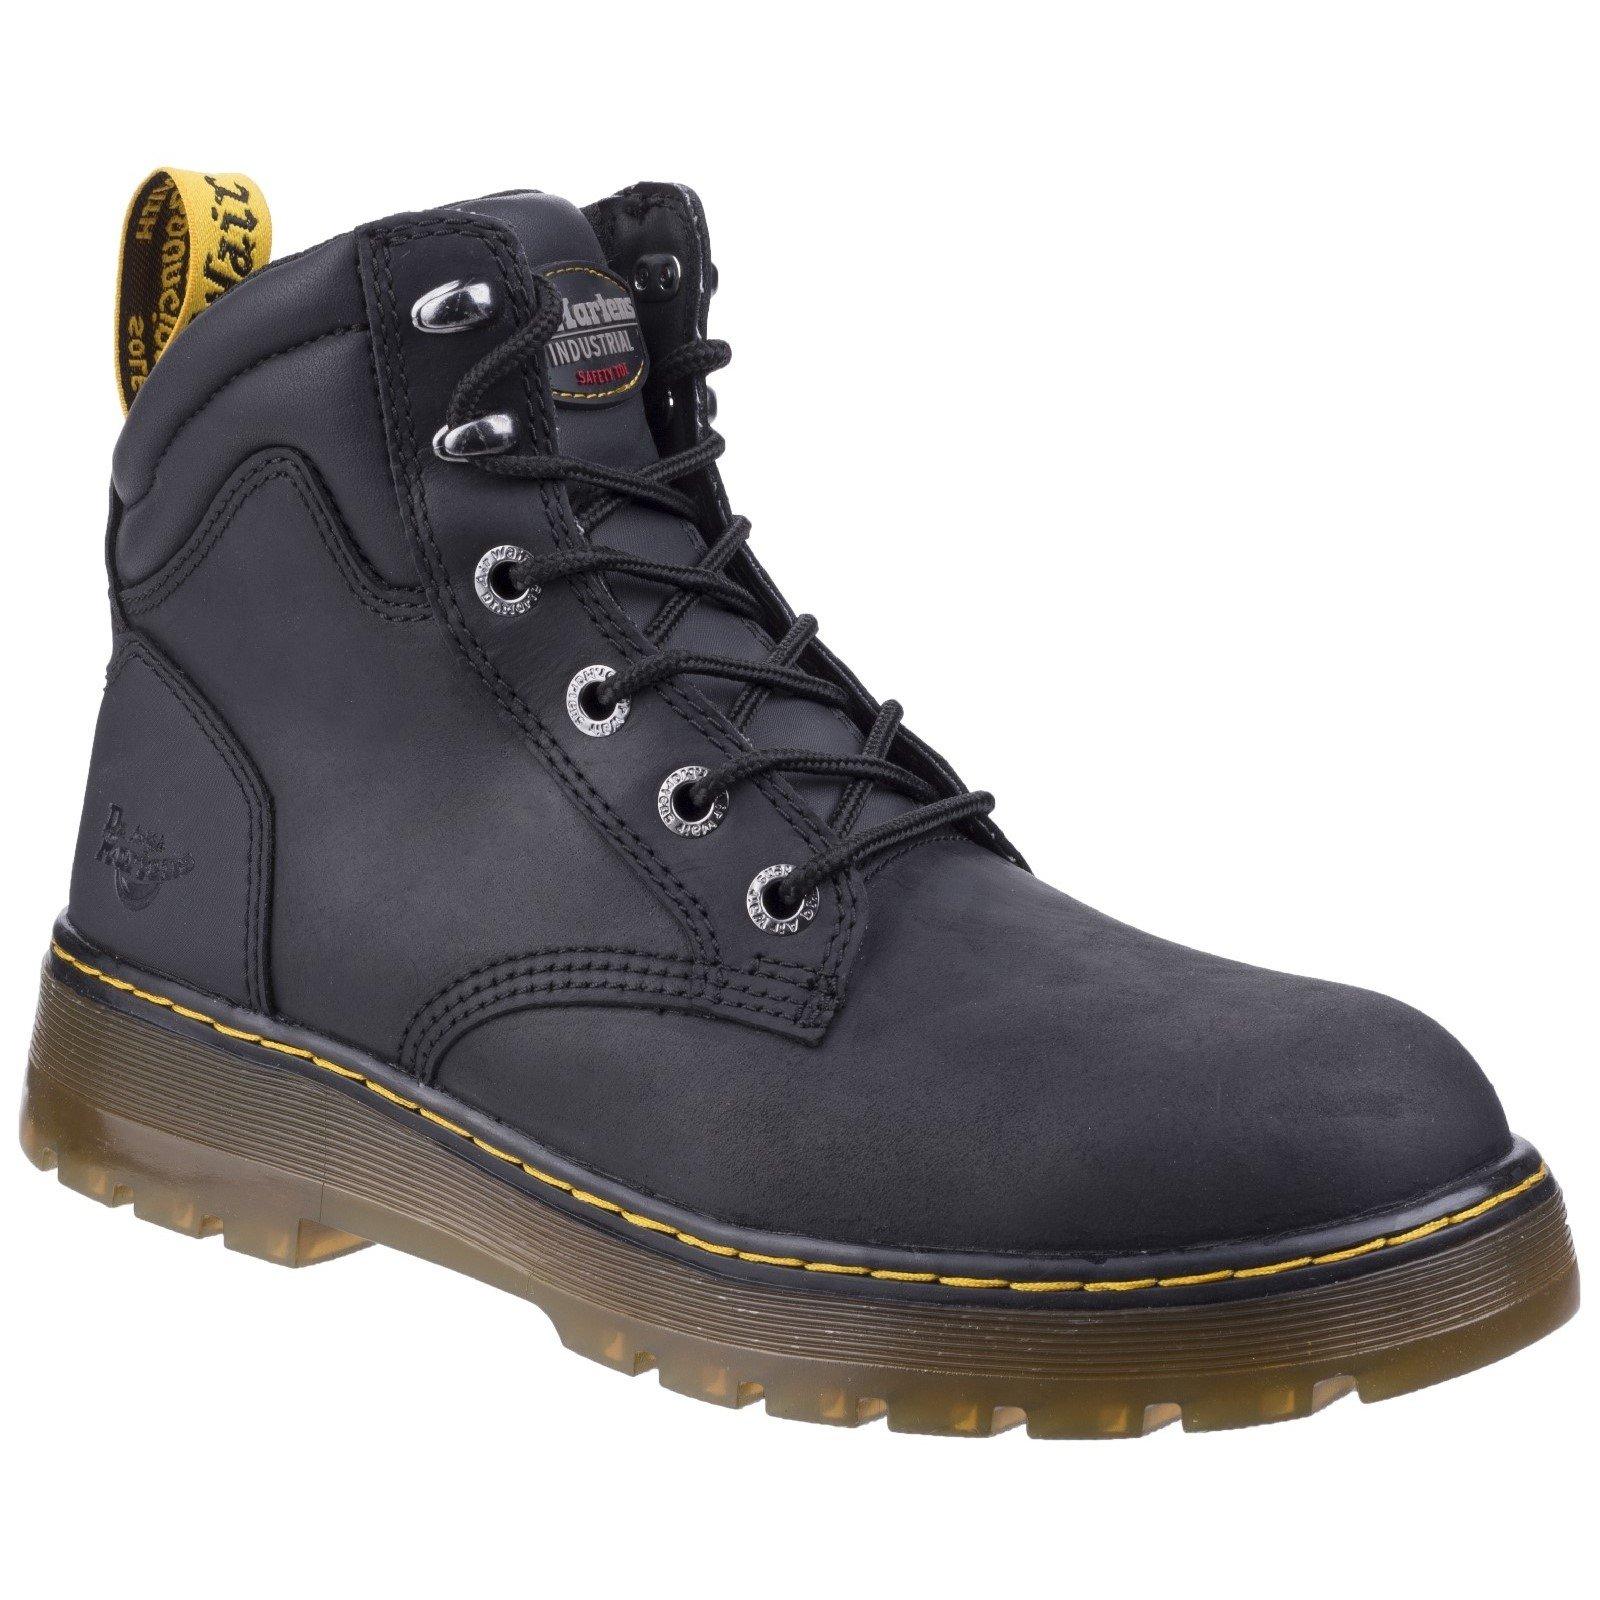 Dr Martens Unisex Brace Hiking Style Safety Boot Various Colours 27702-46606 - Black Republic 11